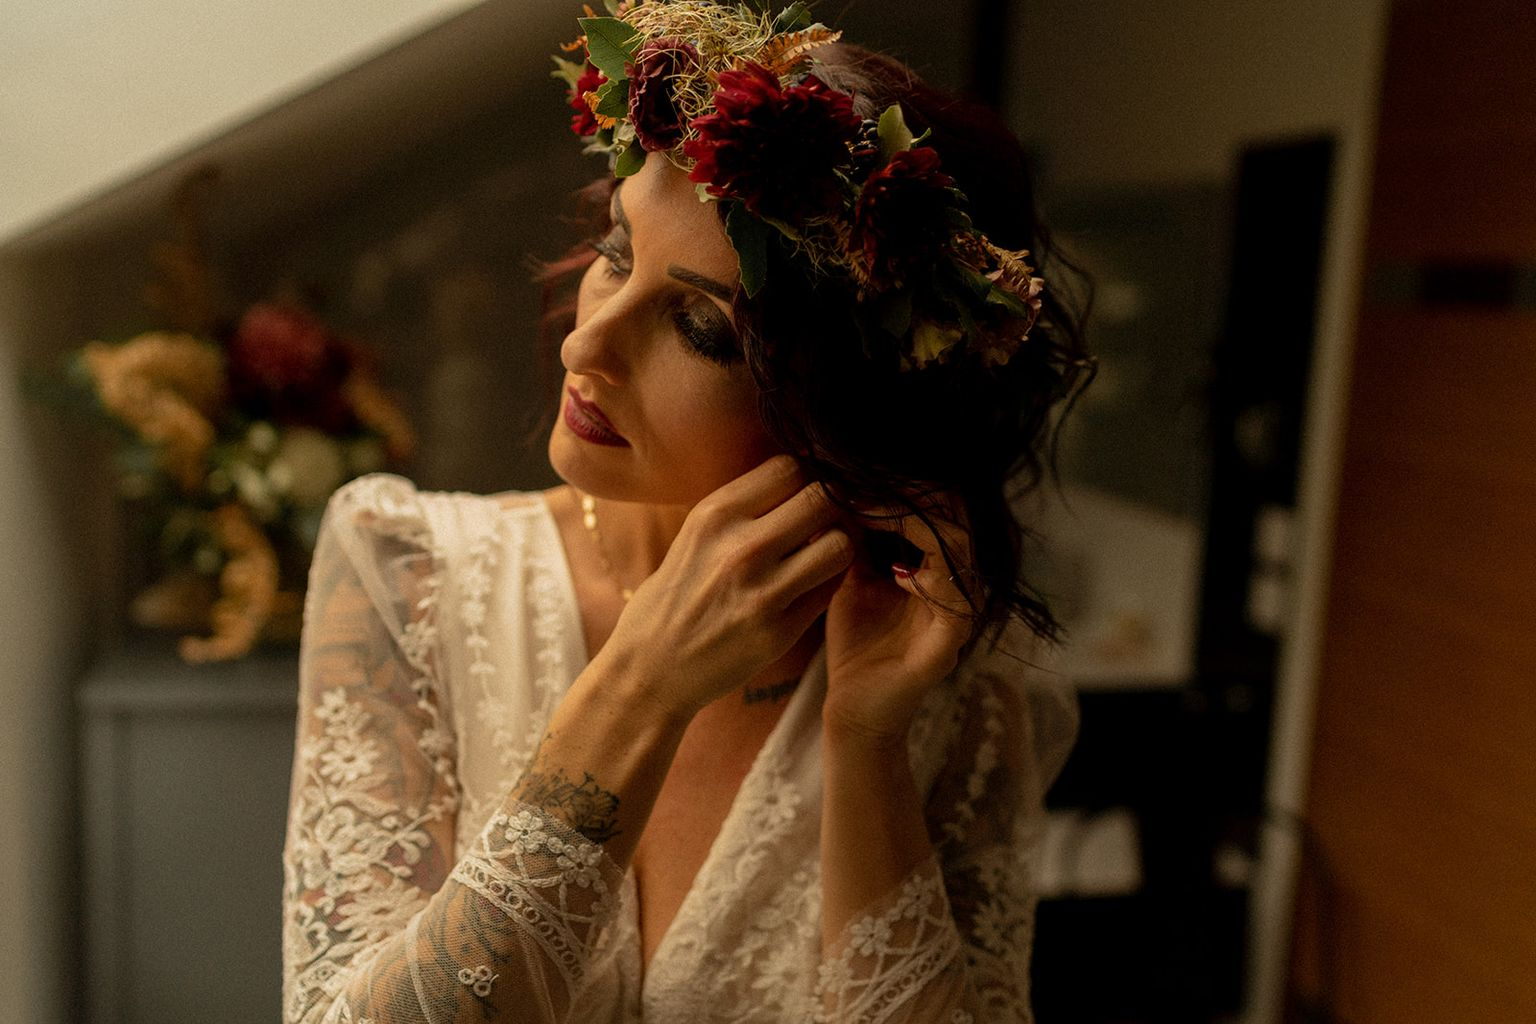 mariage elopement foret automne